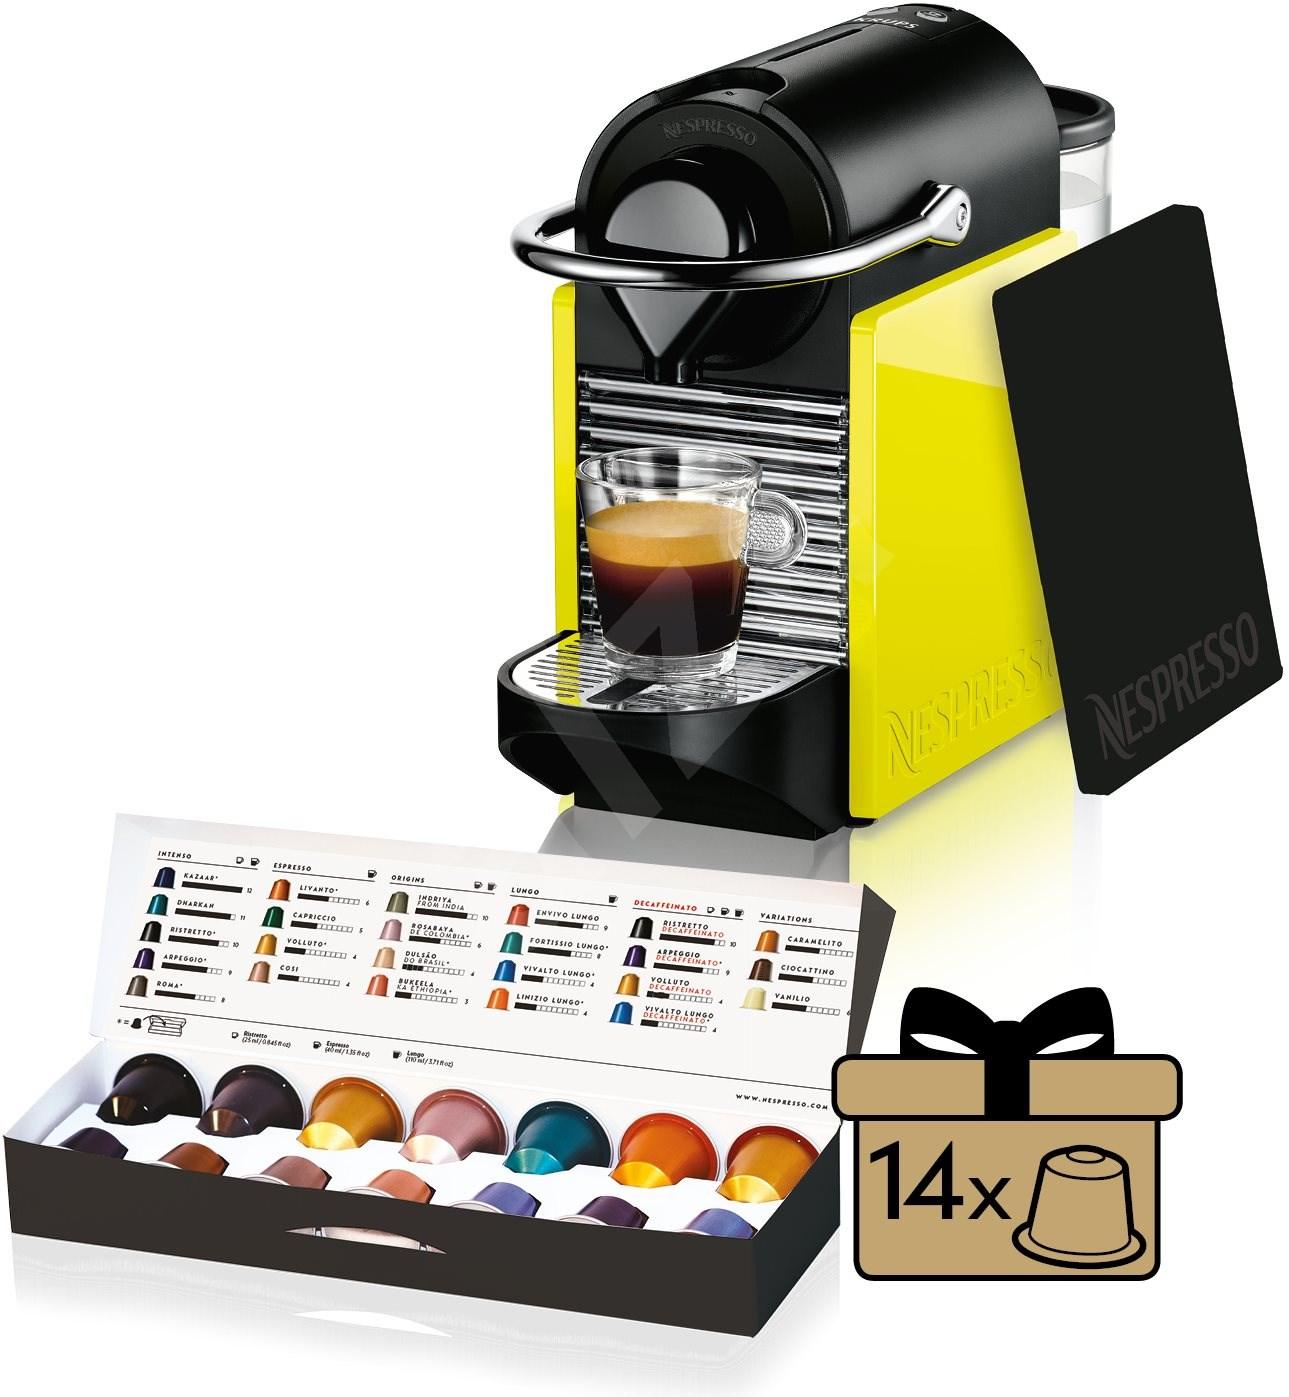 nespresso pixie clips xn 3020 kapsel kaffeemaschine. Black Bedroom Furniture Sets. Home Design Ideas